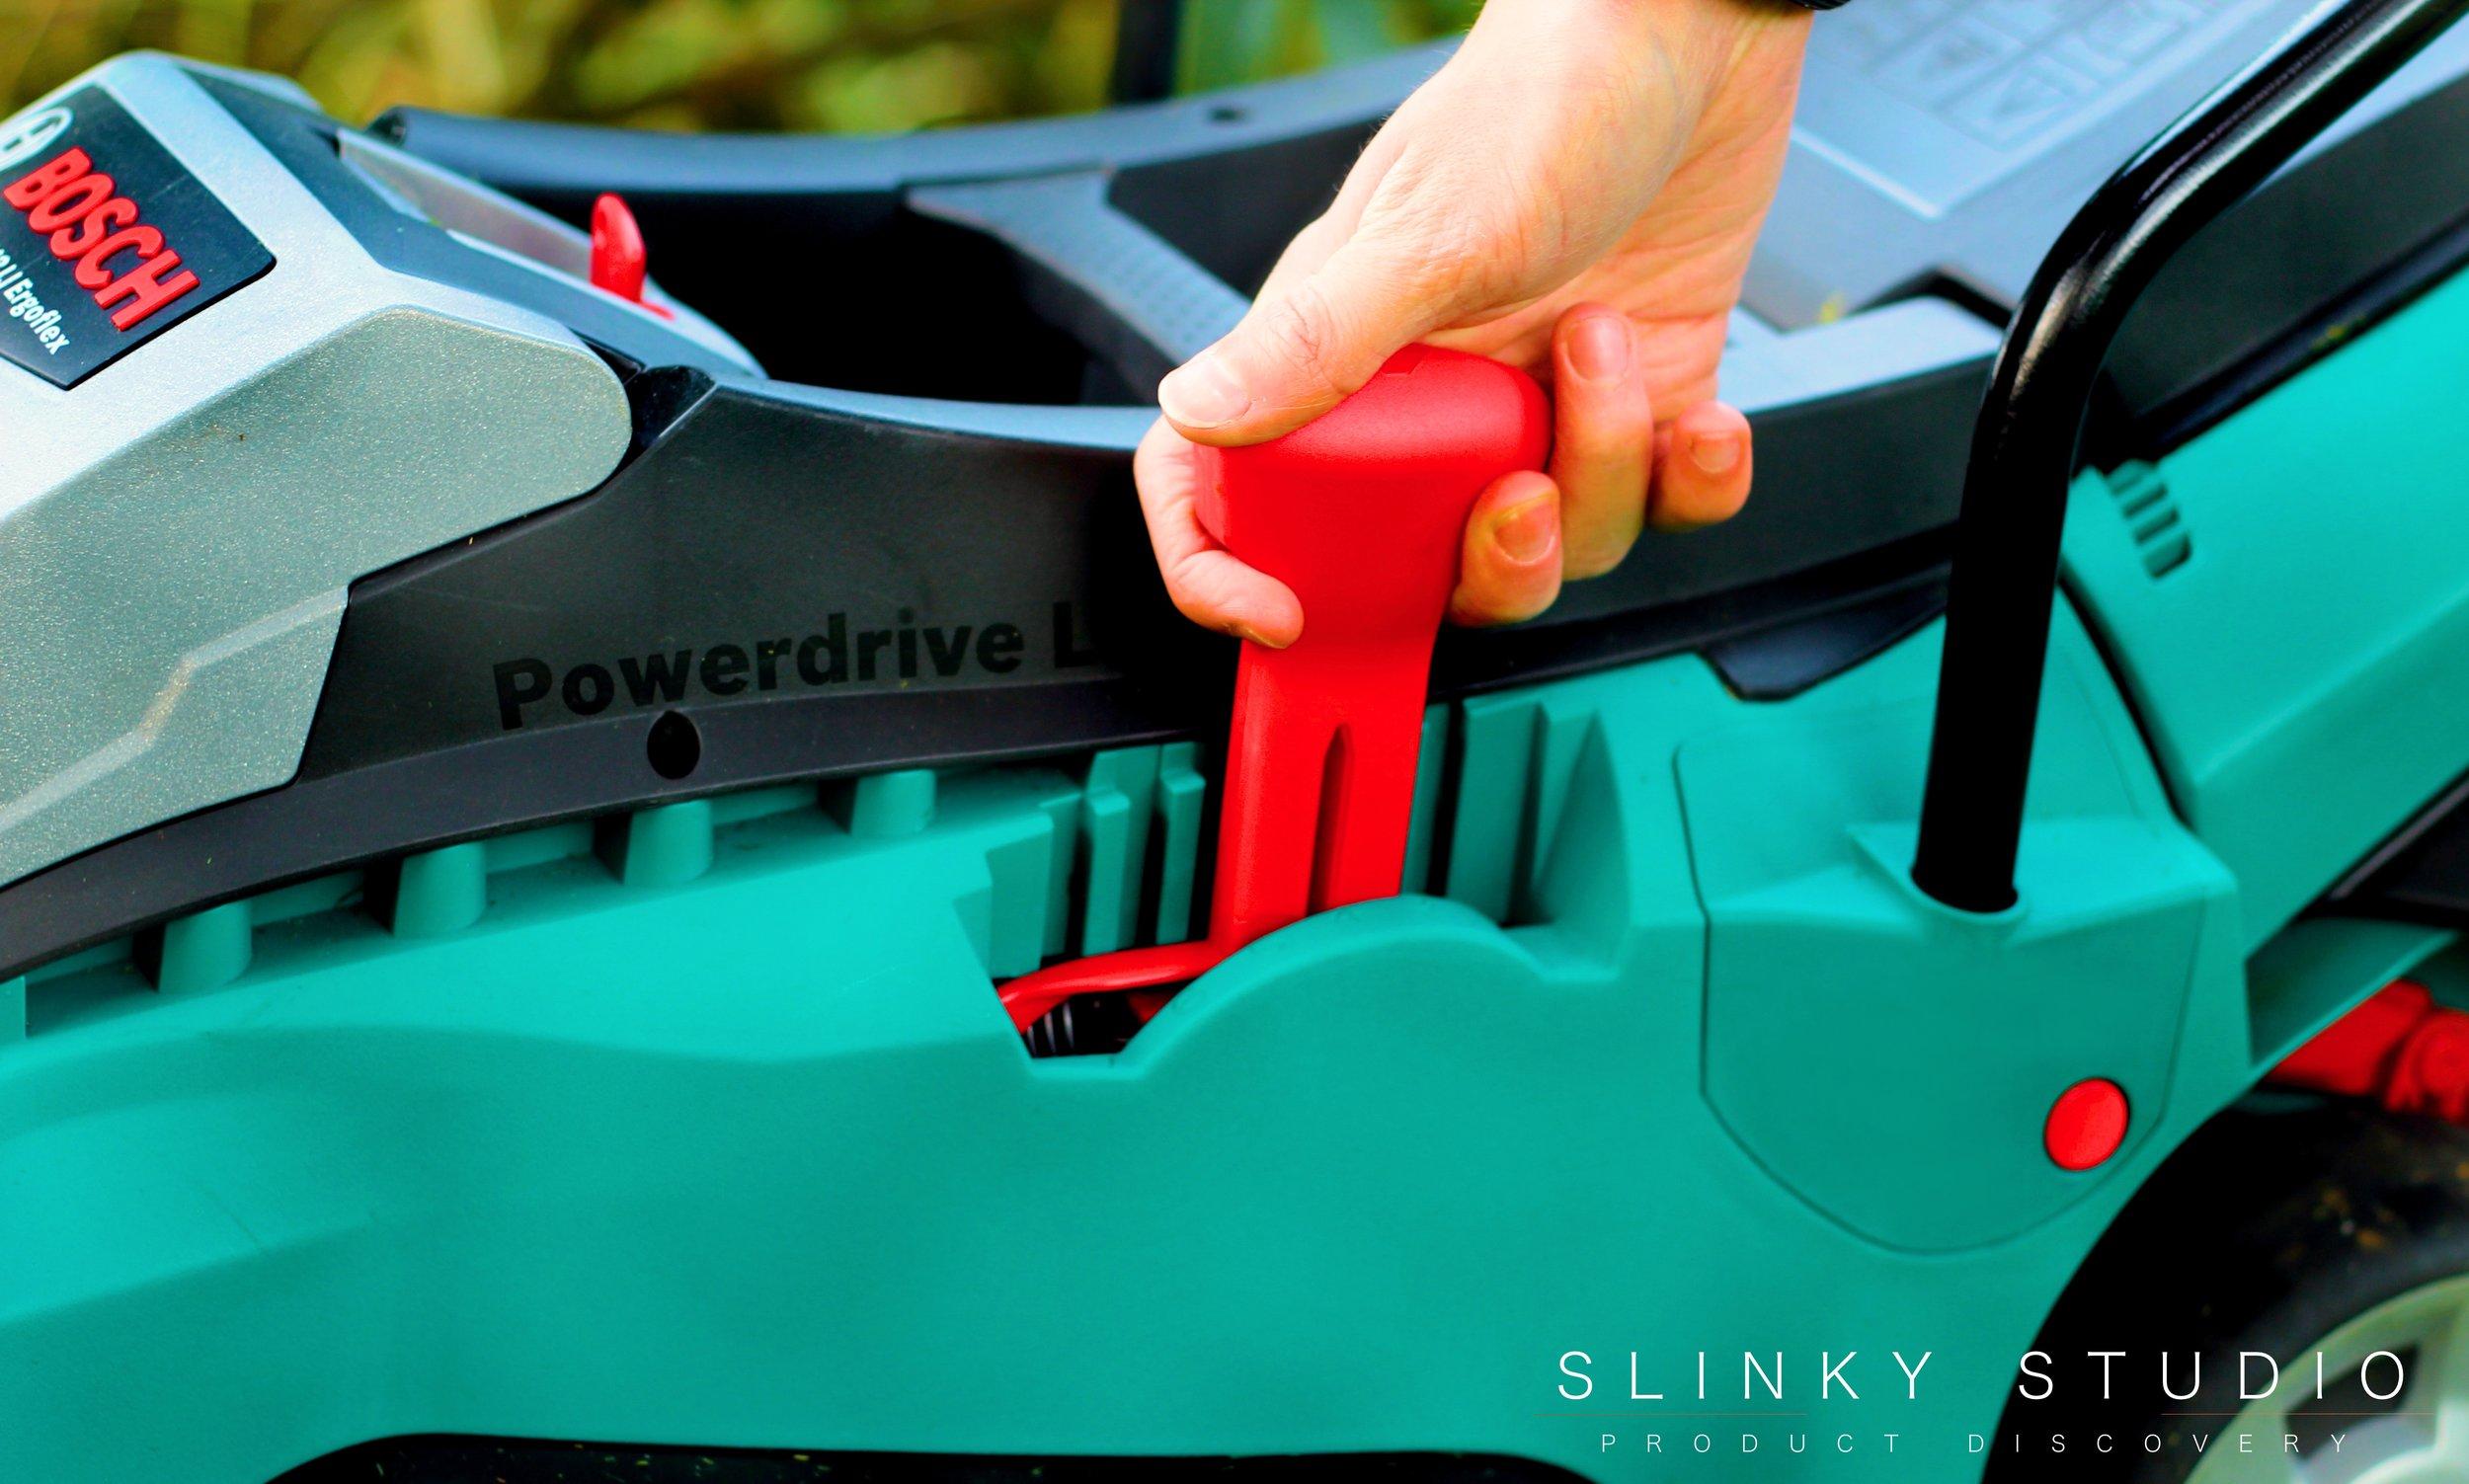 Bosch Rotak 43 LI Ergoflex Cordless Lawnmower Height Adjustment Lever.jpg